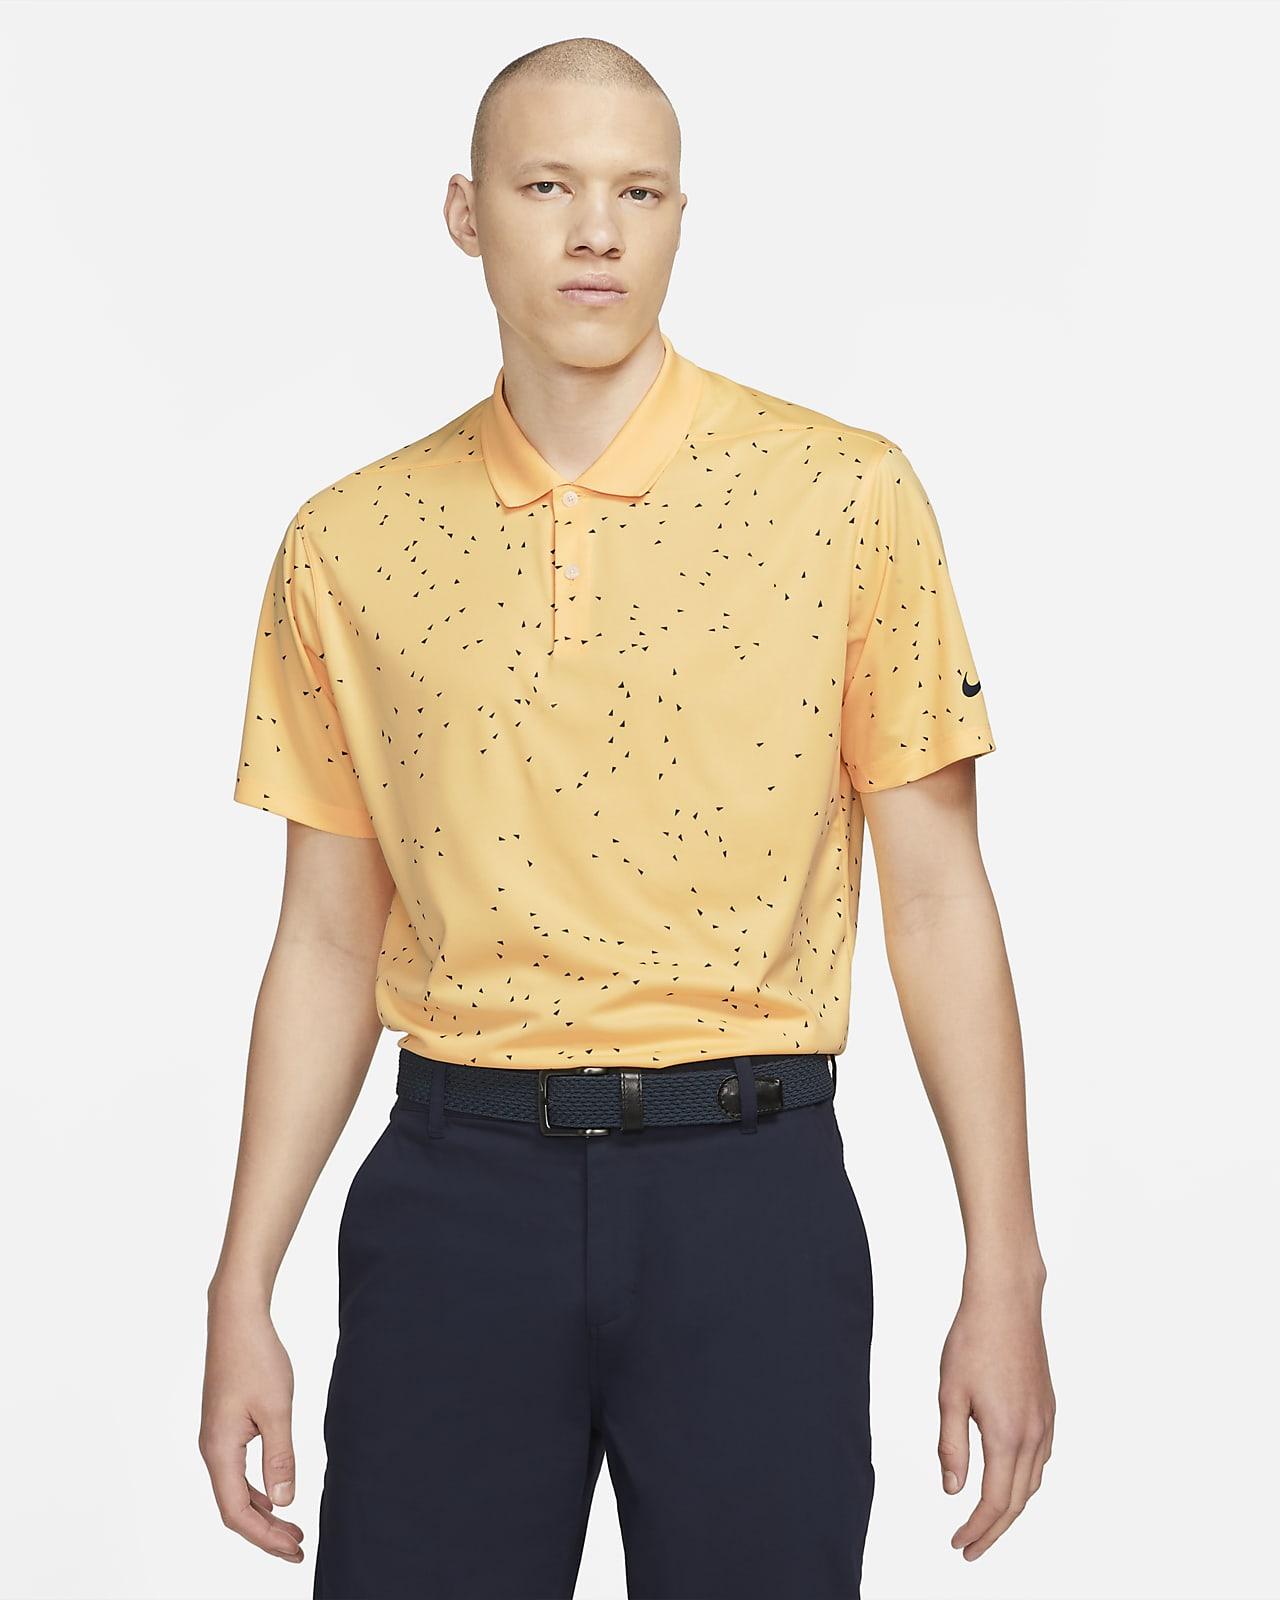 Nike Dri-FIT Victory Men's Printed Golf Polo